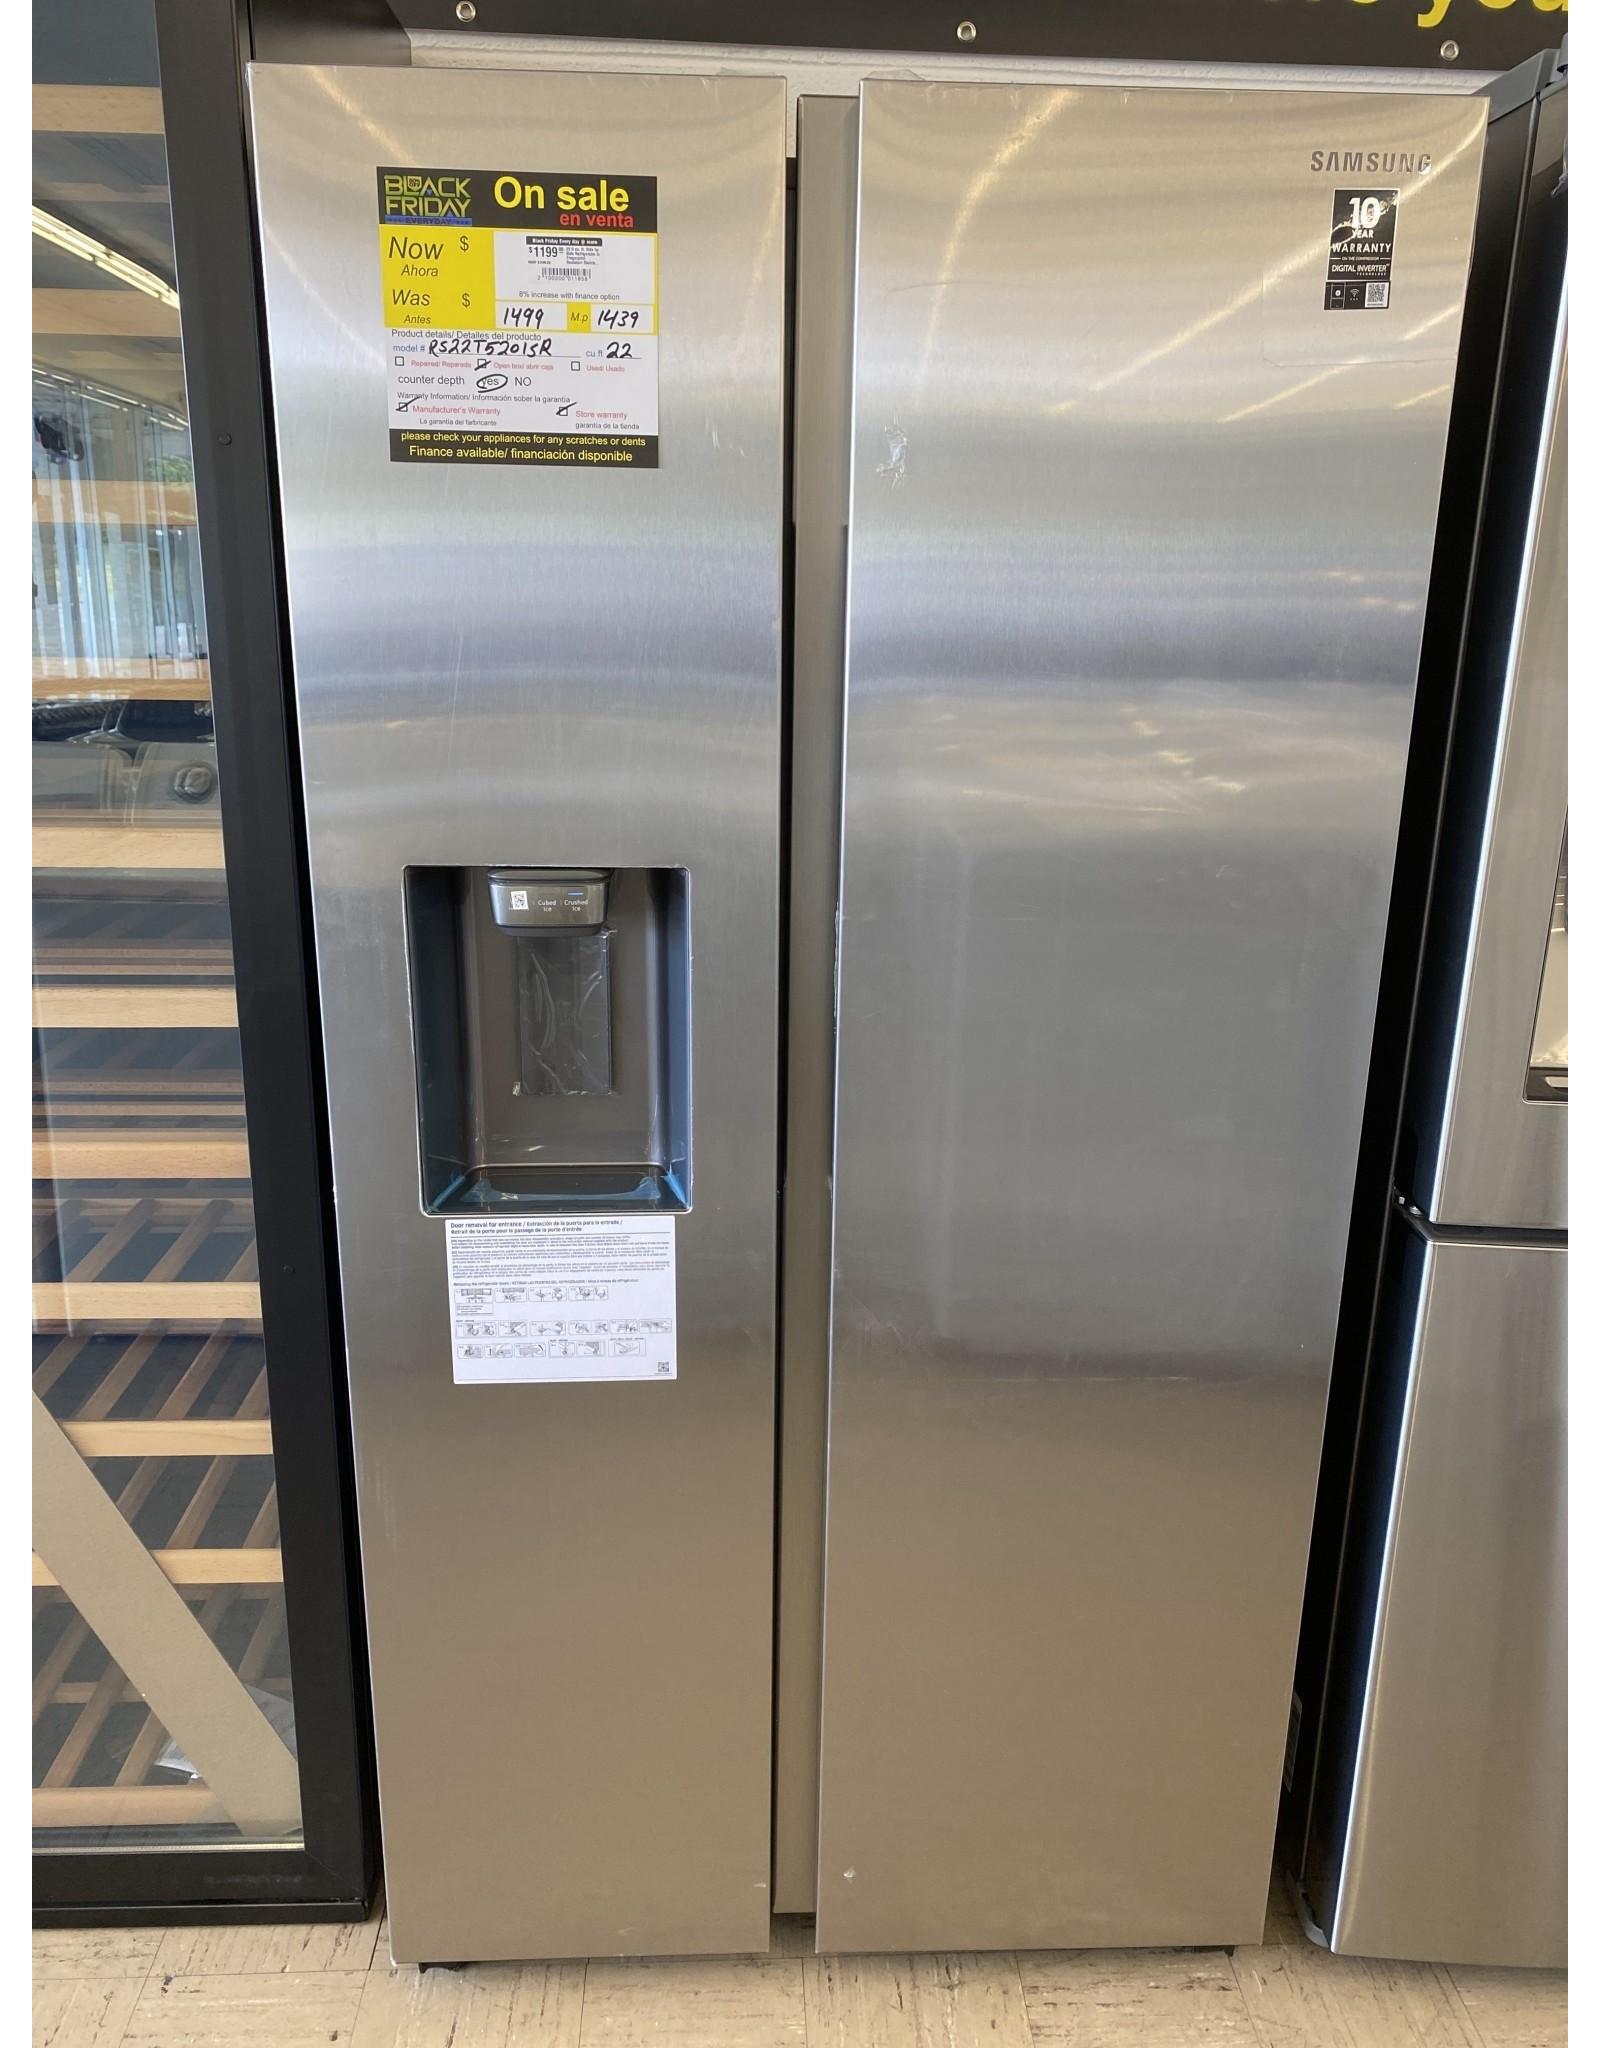 SAMSUNG 22.0 cu. ft. Side by Side Refrigerator in Fingerprint Resistant Stainless Steel, Counter Depth